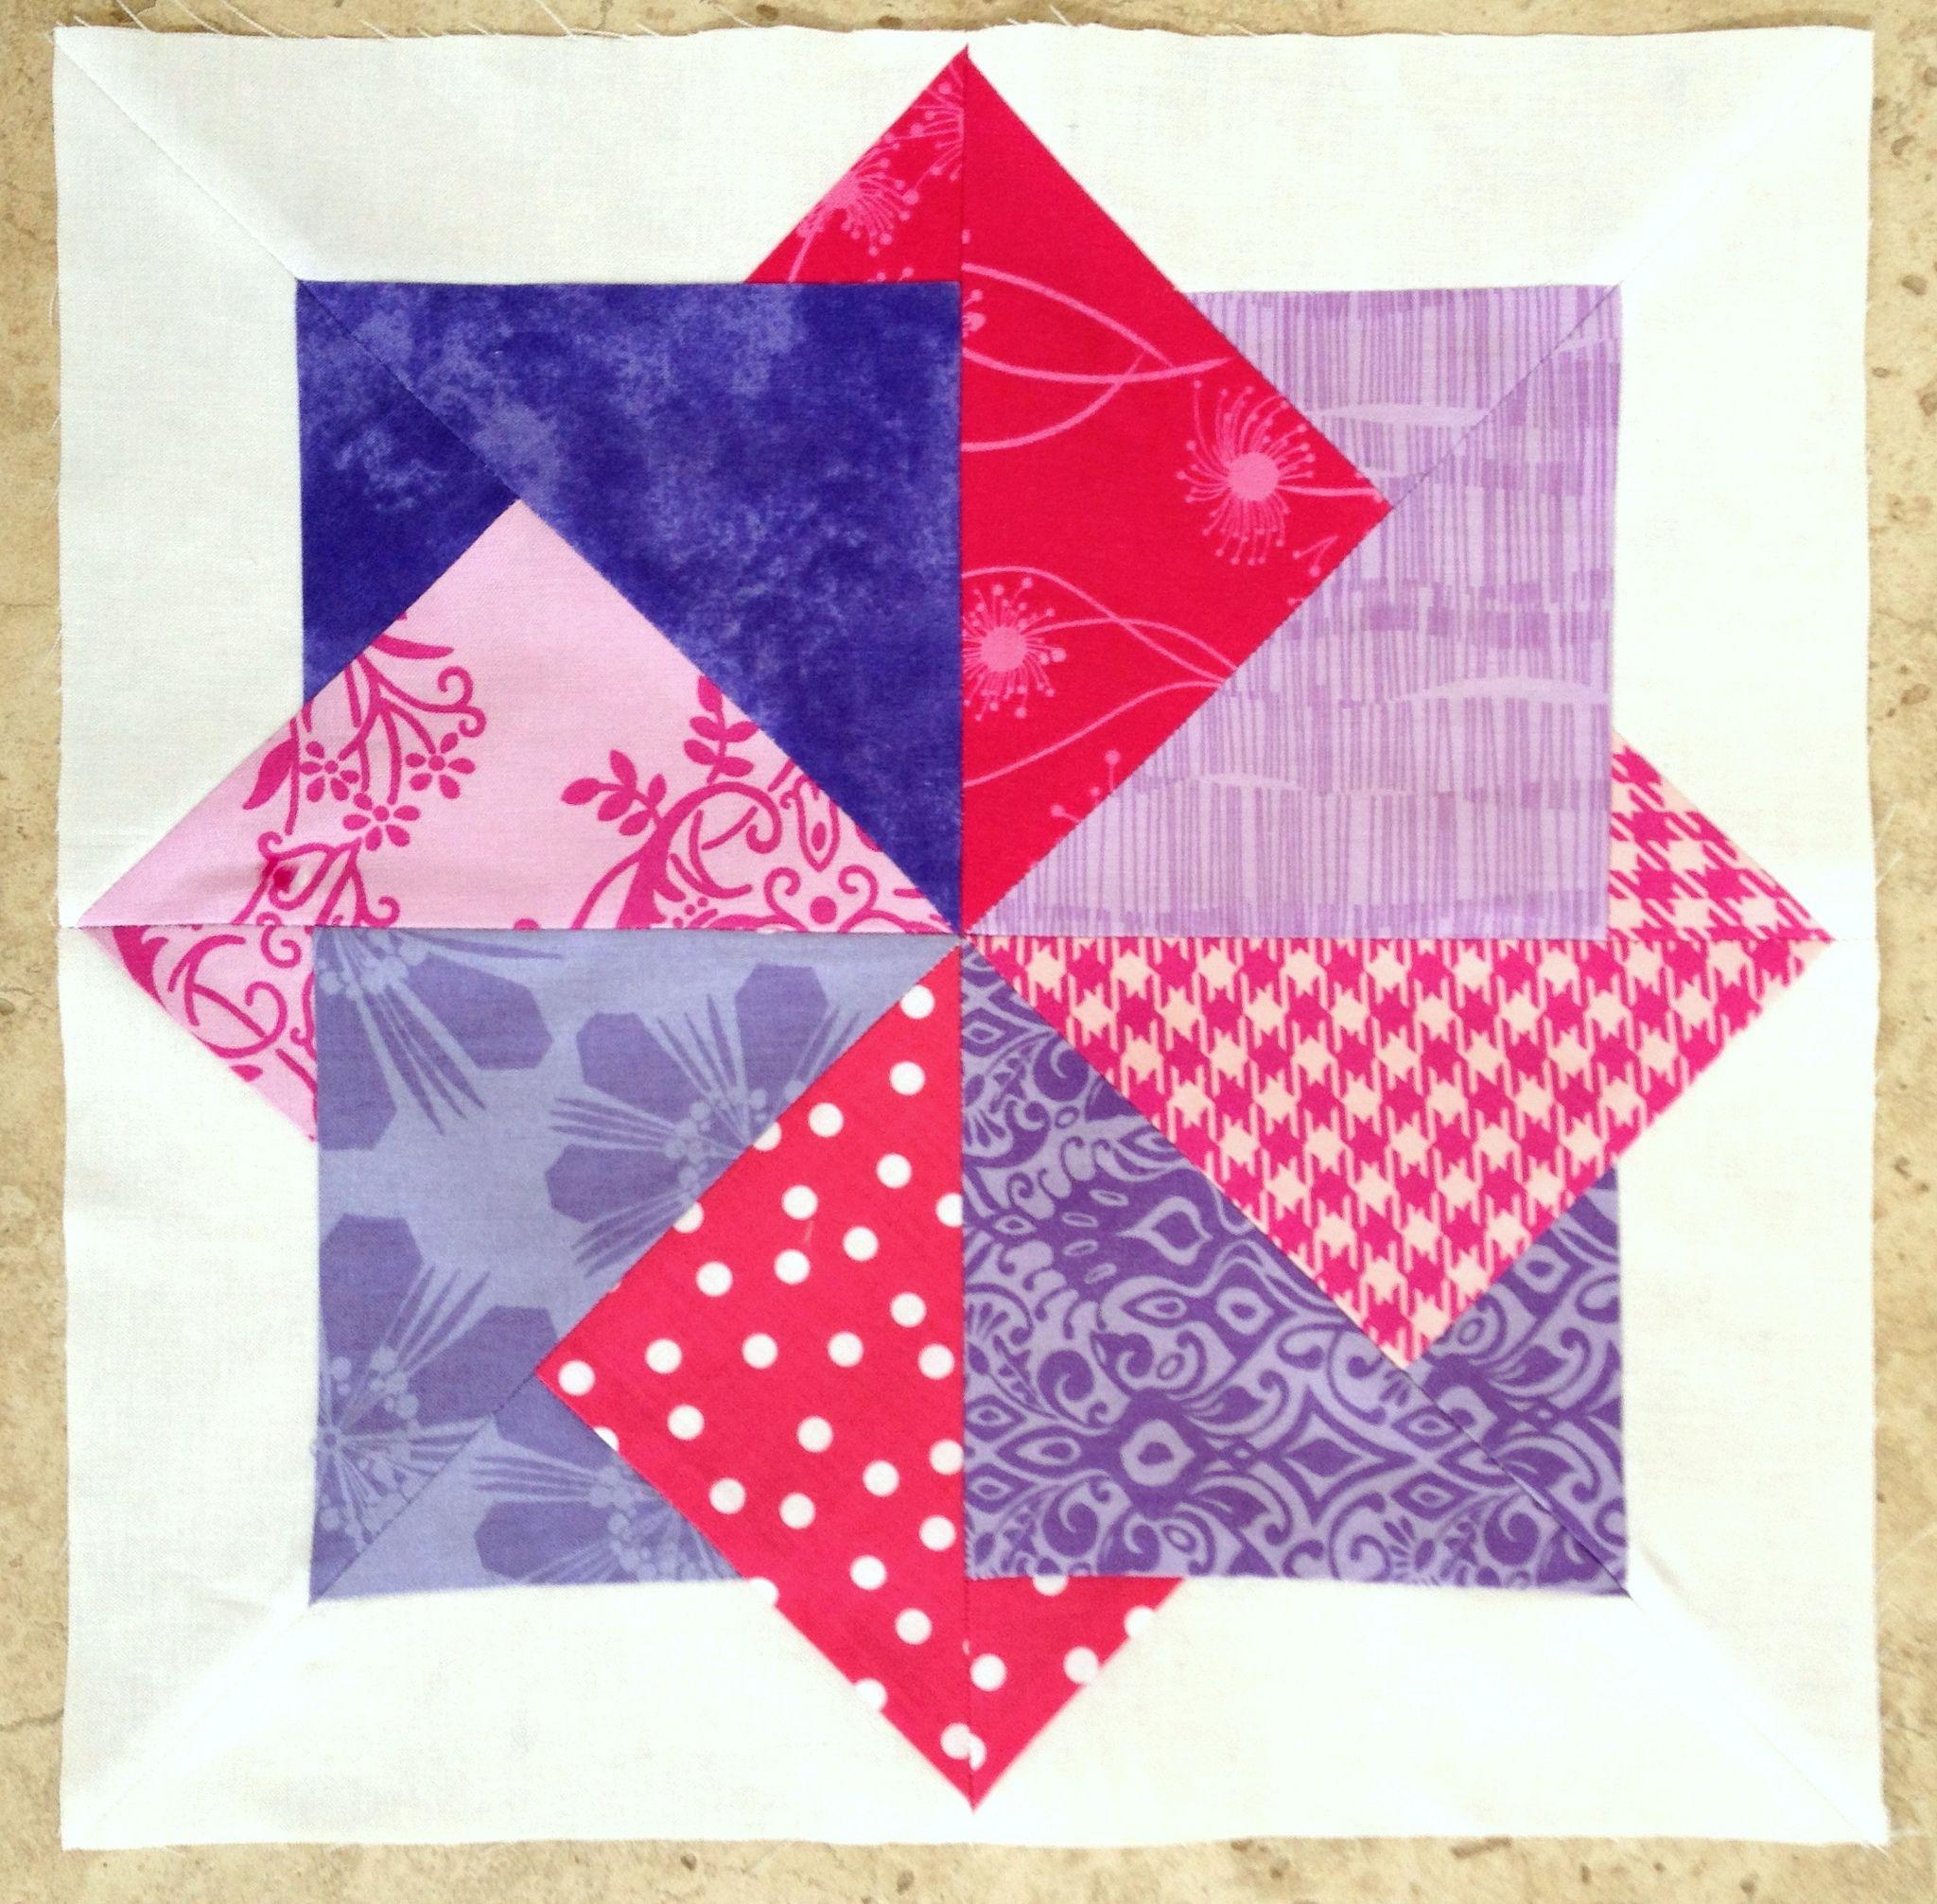 https://flic.kr/p/eedg8D   Modern Bee Block #1 for Alli518   Free Pattern! craftsewcreate.blogspot.com/2013/05/super-card-trick-bloc...